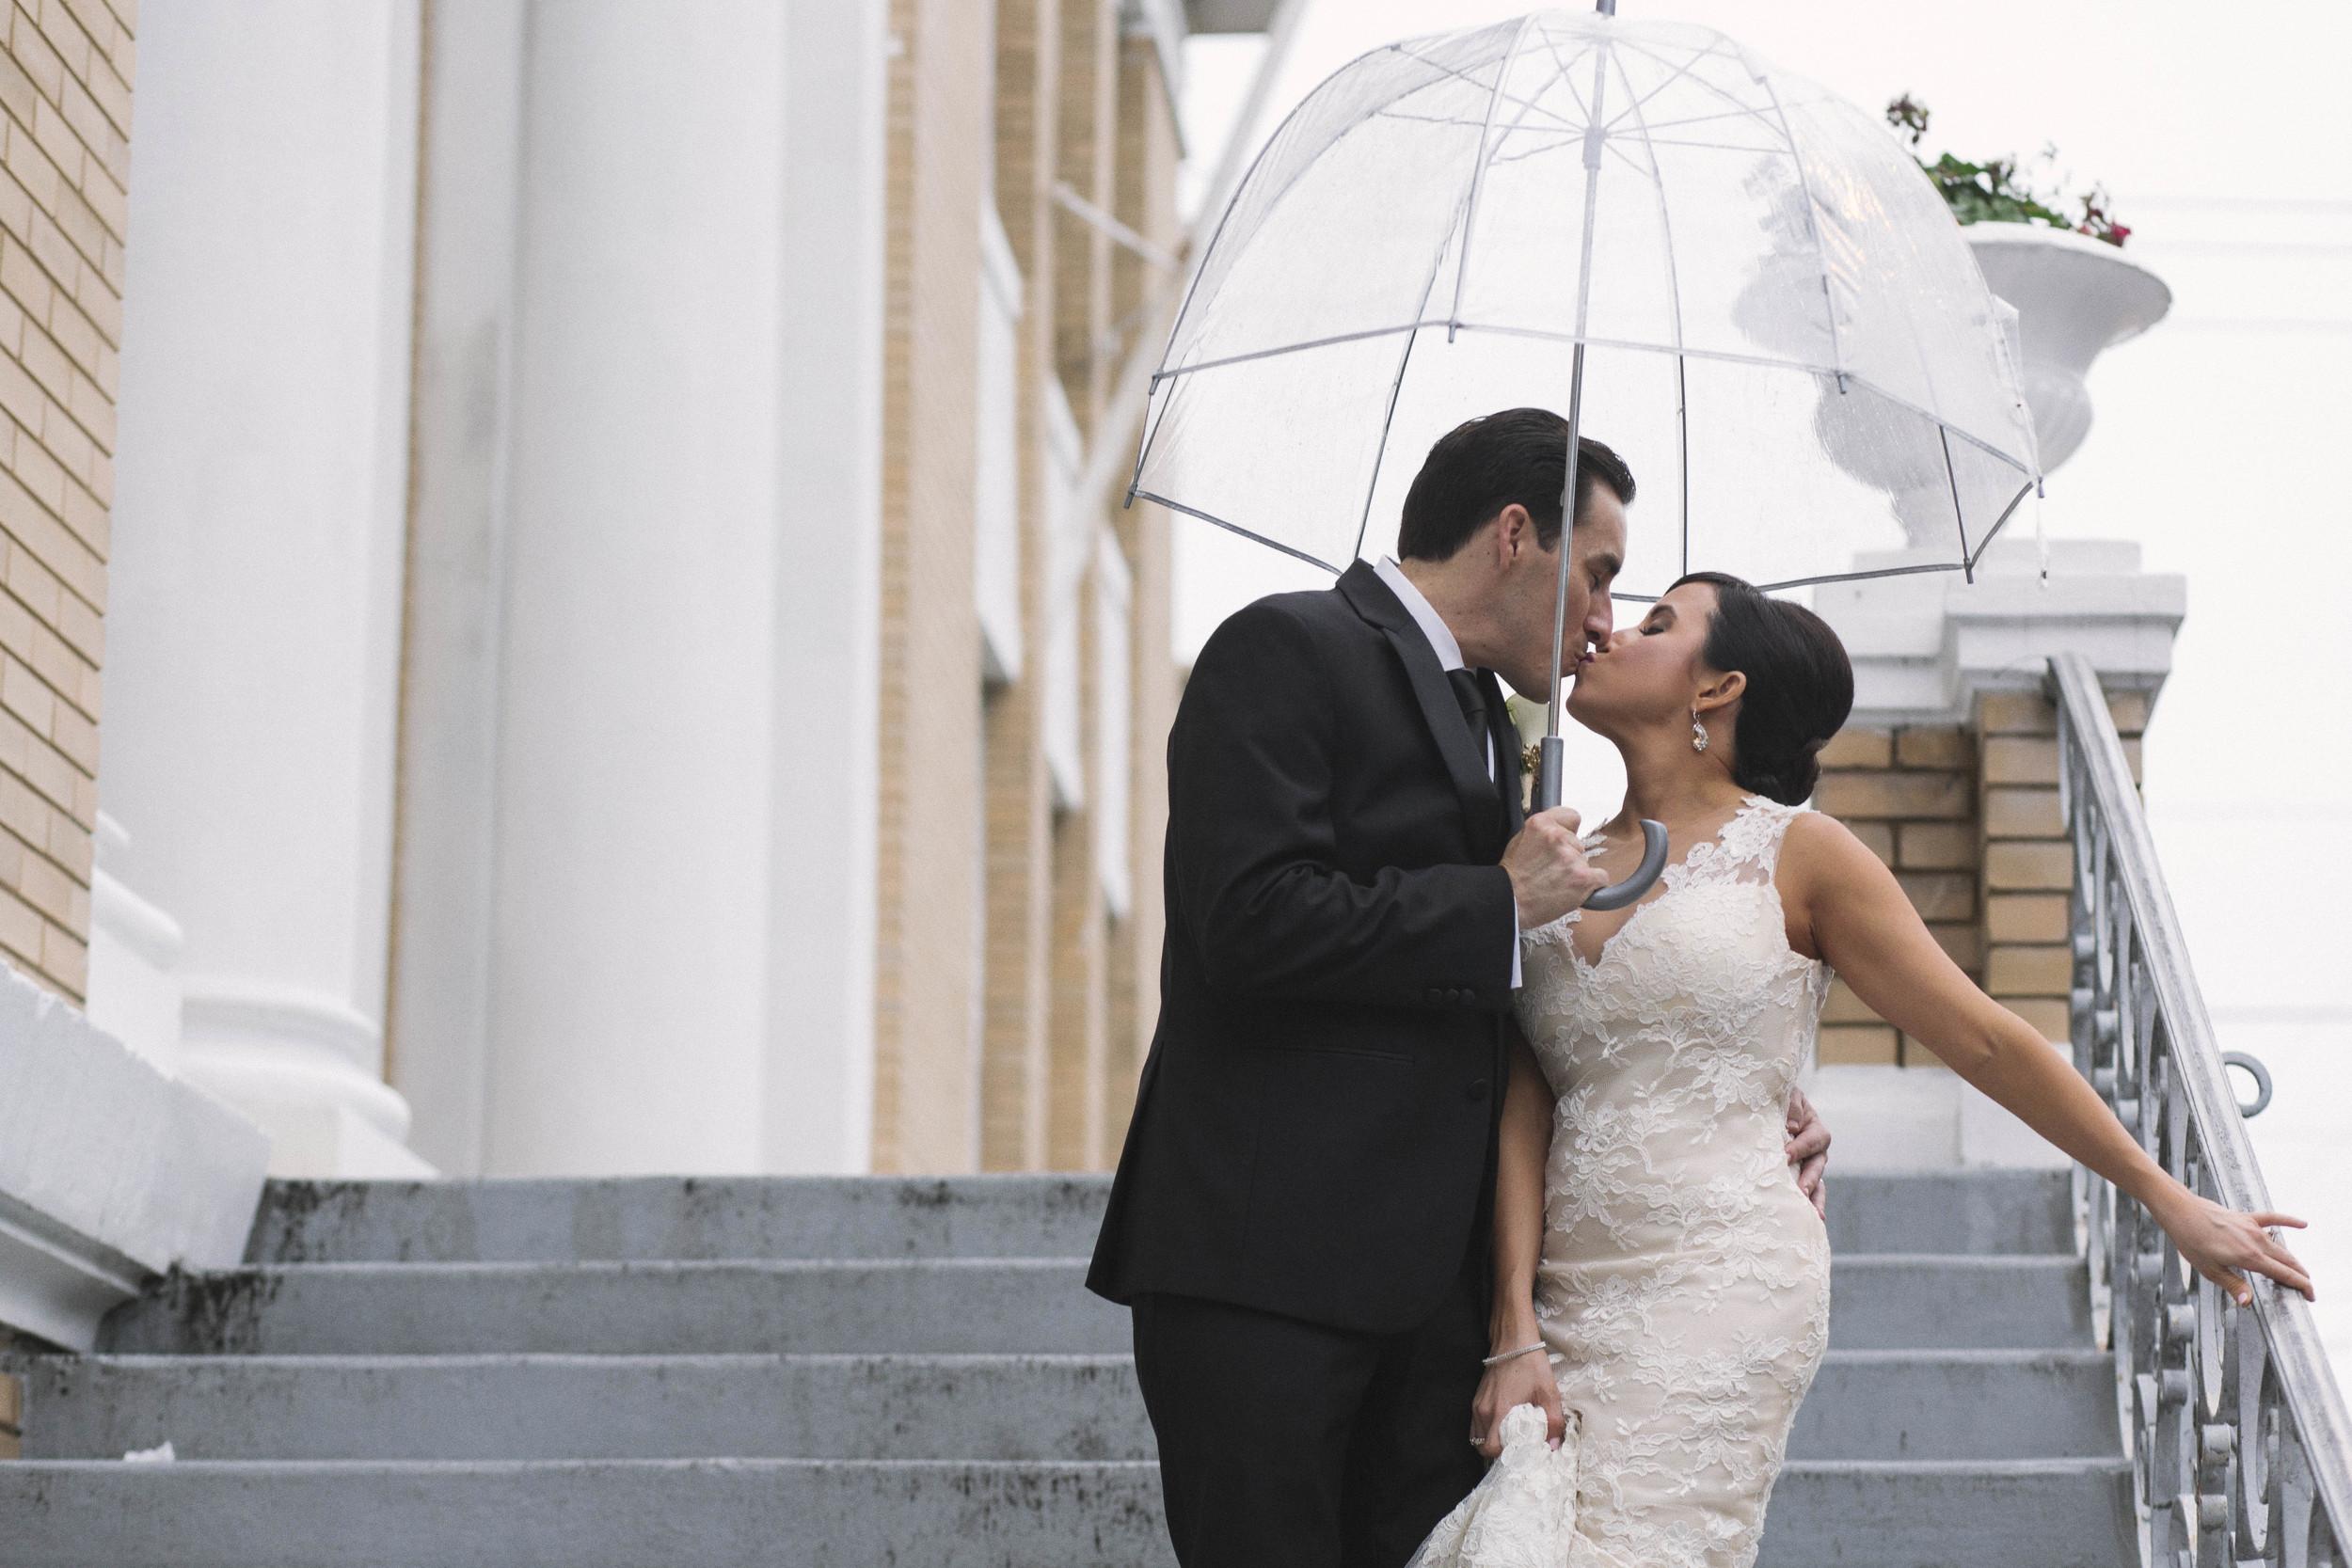 winsor event studio ybor wedding tampa cobblestone street umbrella